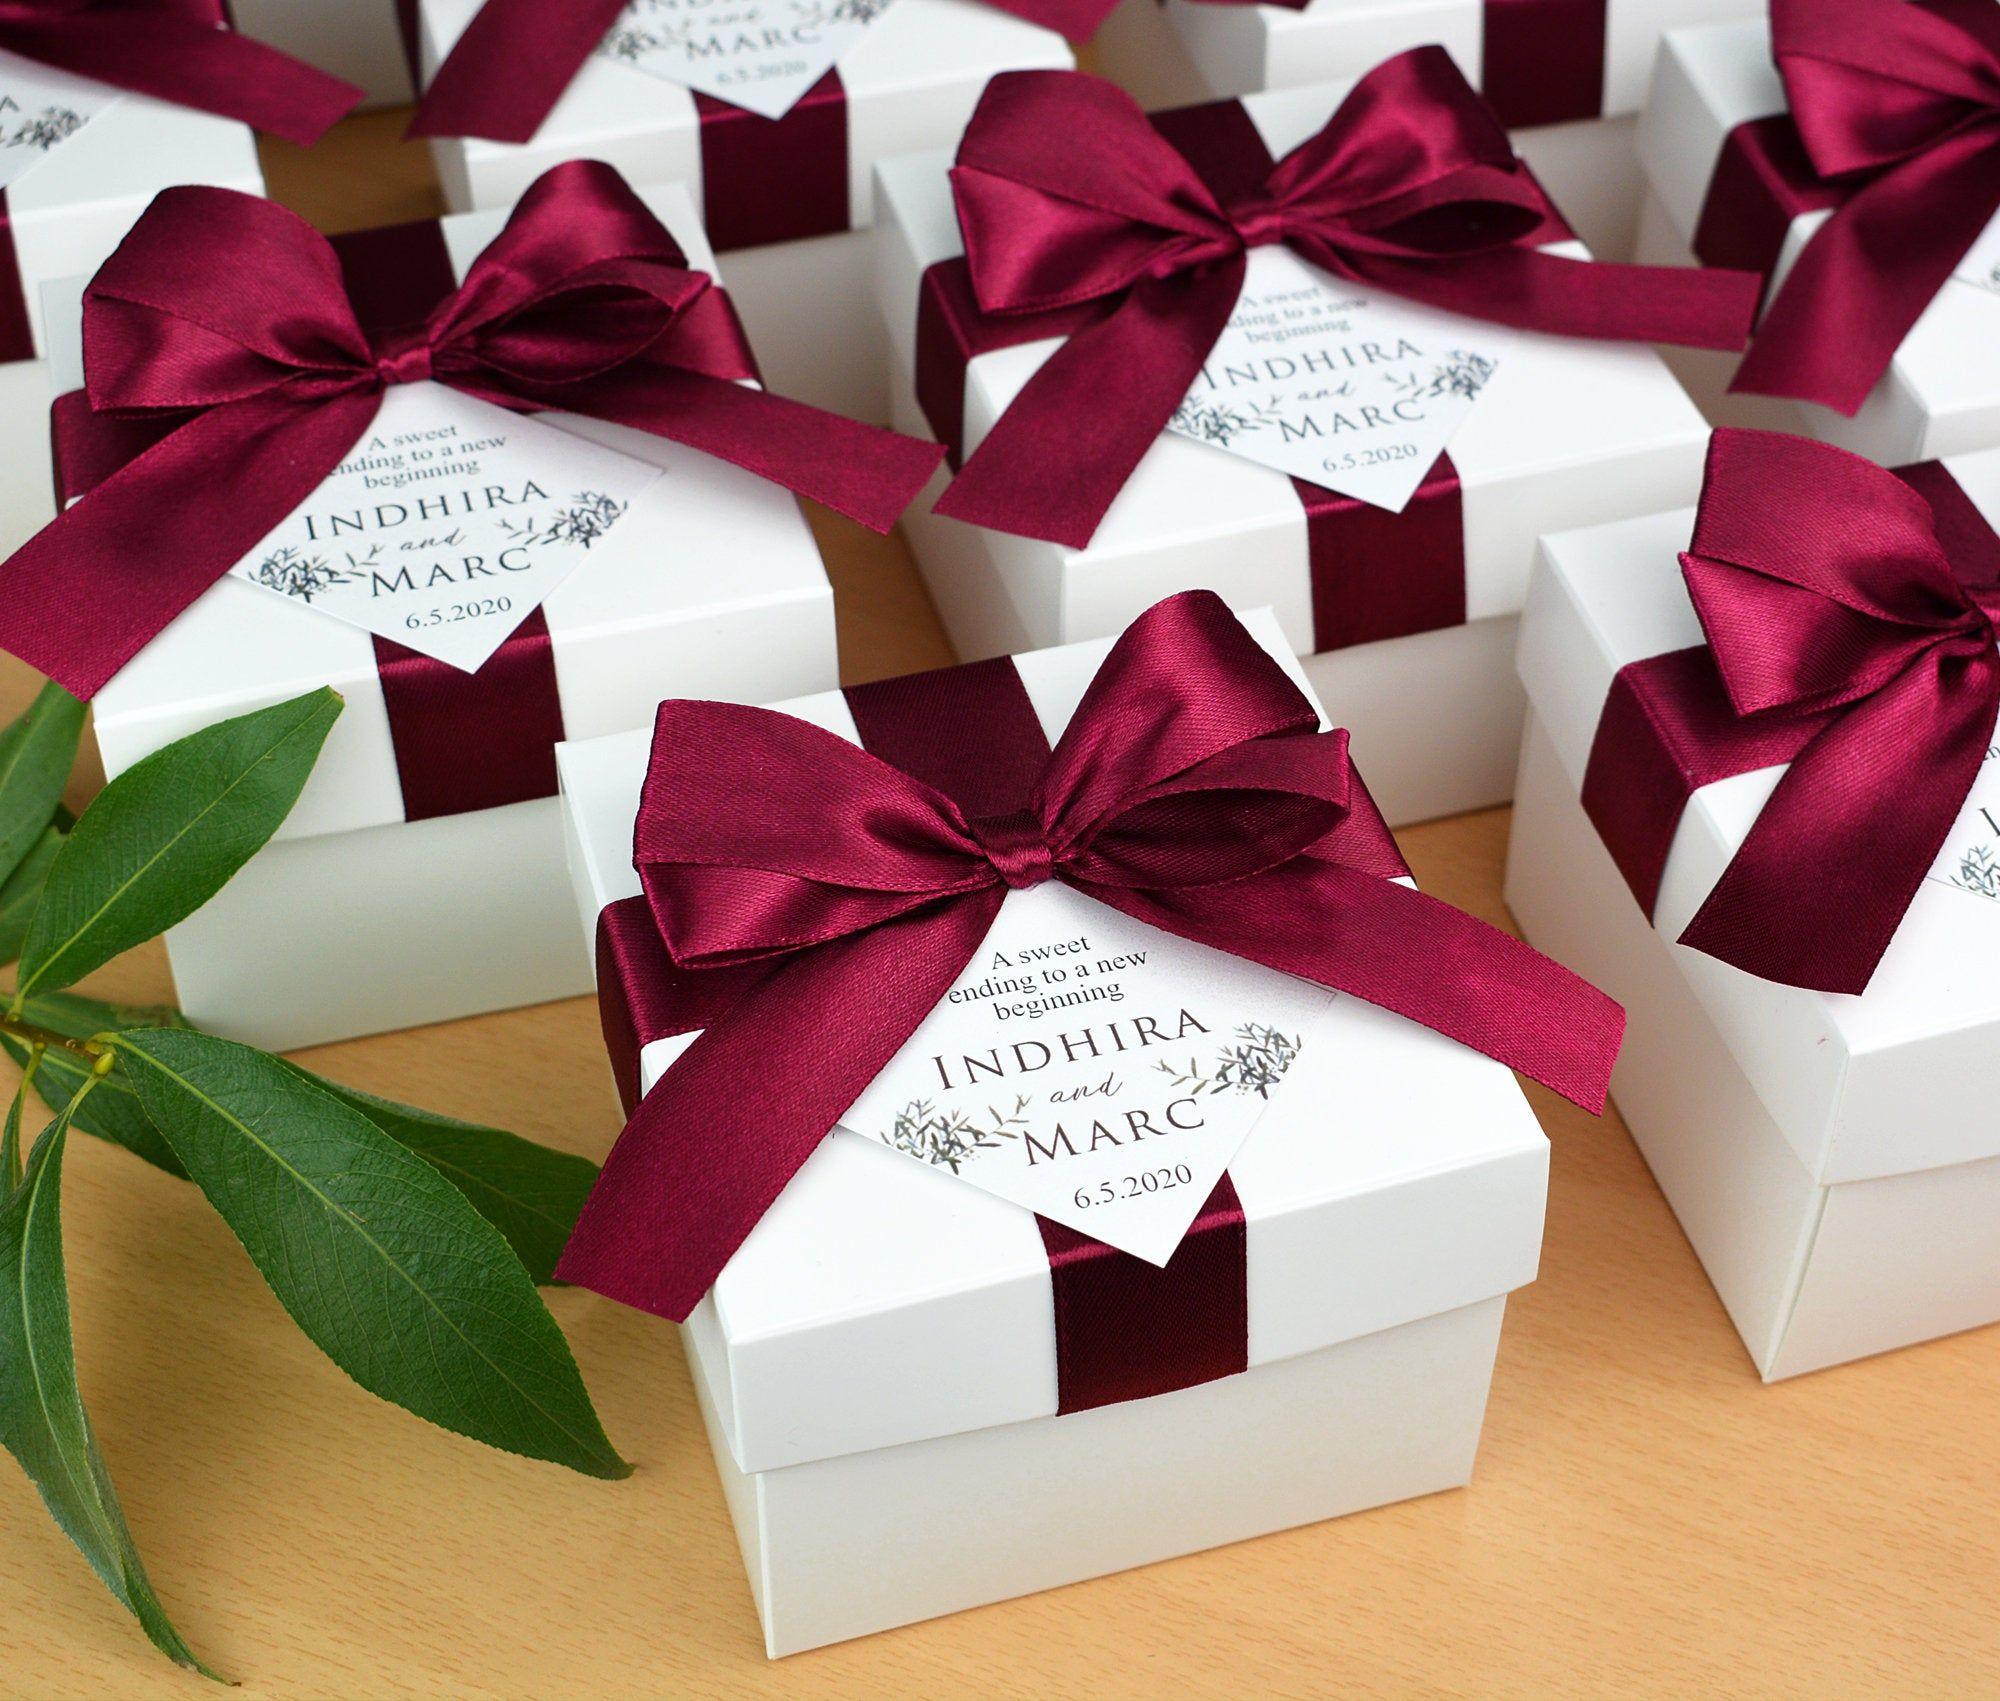 Elegant Wedding Favor Box With Wine Burgundy Satin Ribbon Bow Etsy In 2020 Champagne Wedding Favors Wedding Favor Boxes Personalized Wedding Box